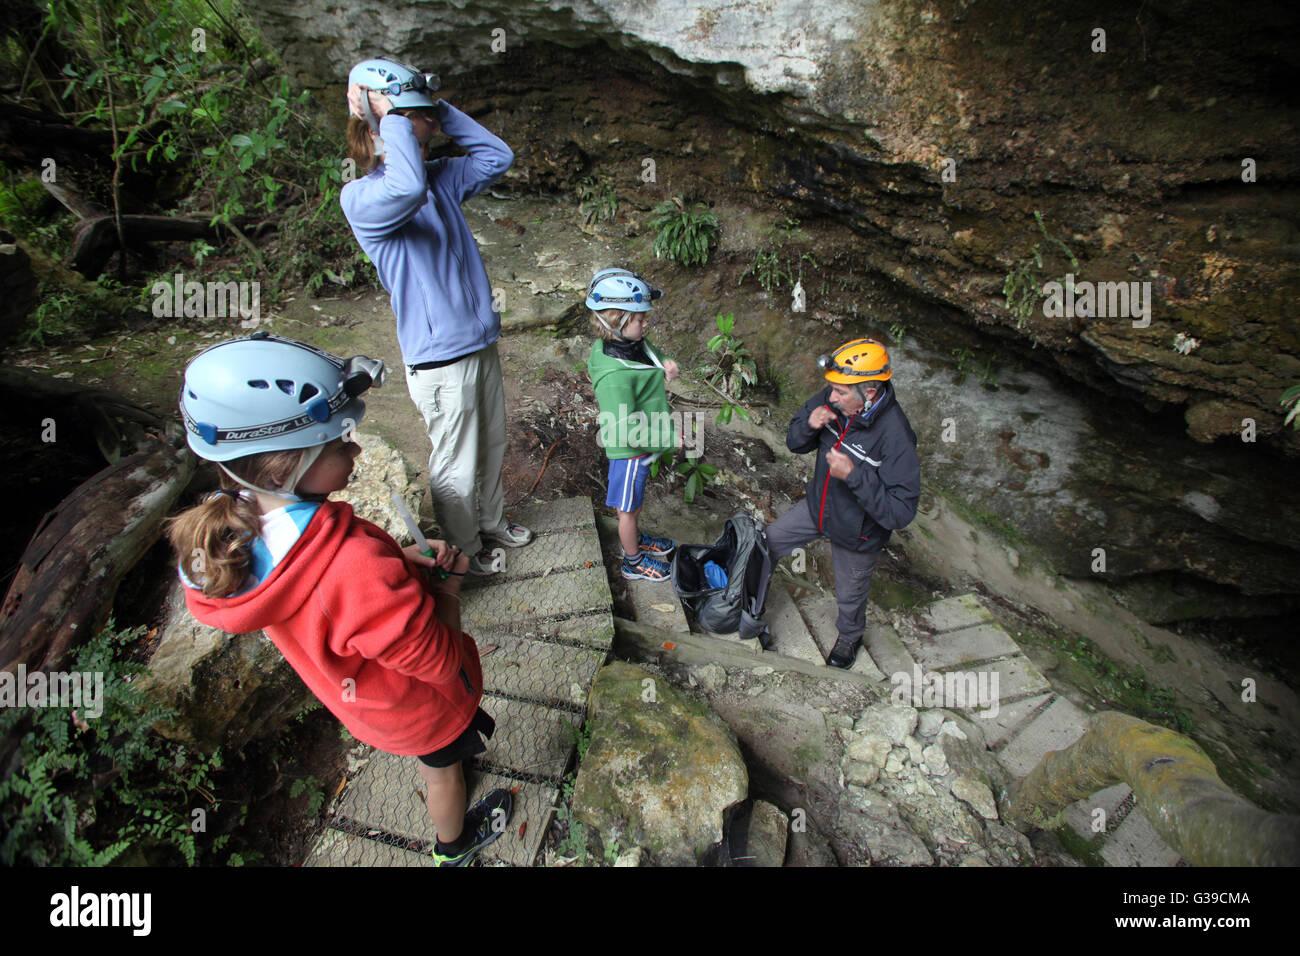 A family prepare to enter caves at Oparara, near Karamea, with a guide Stock Photo